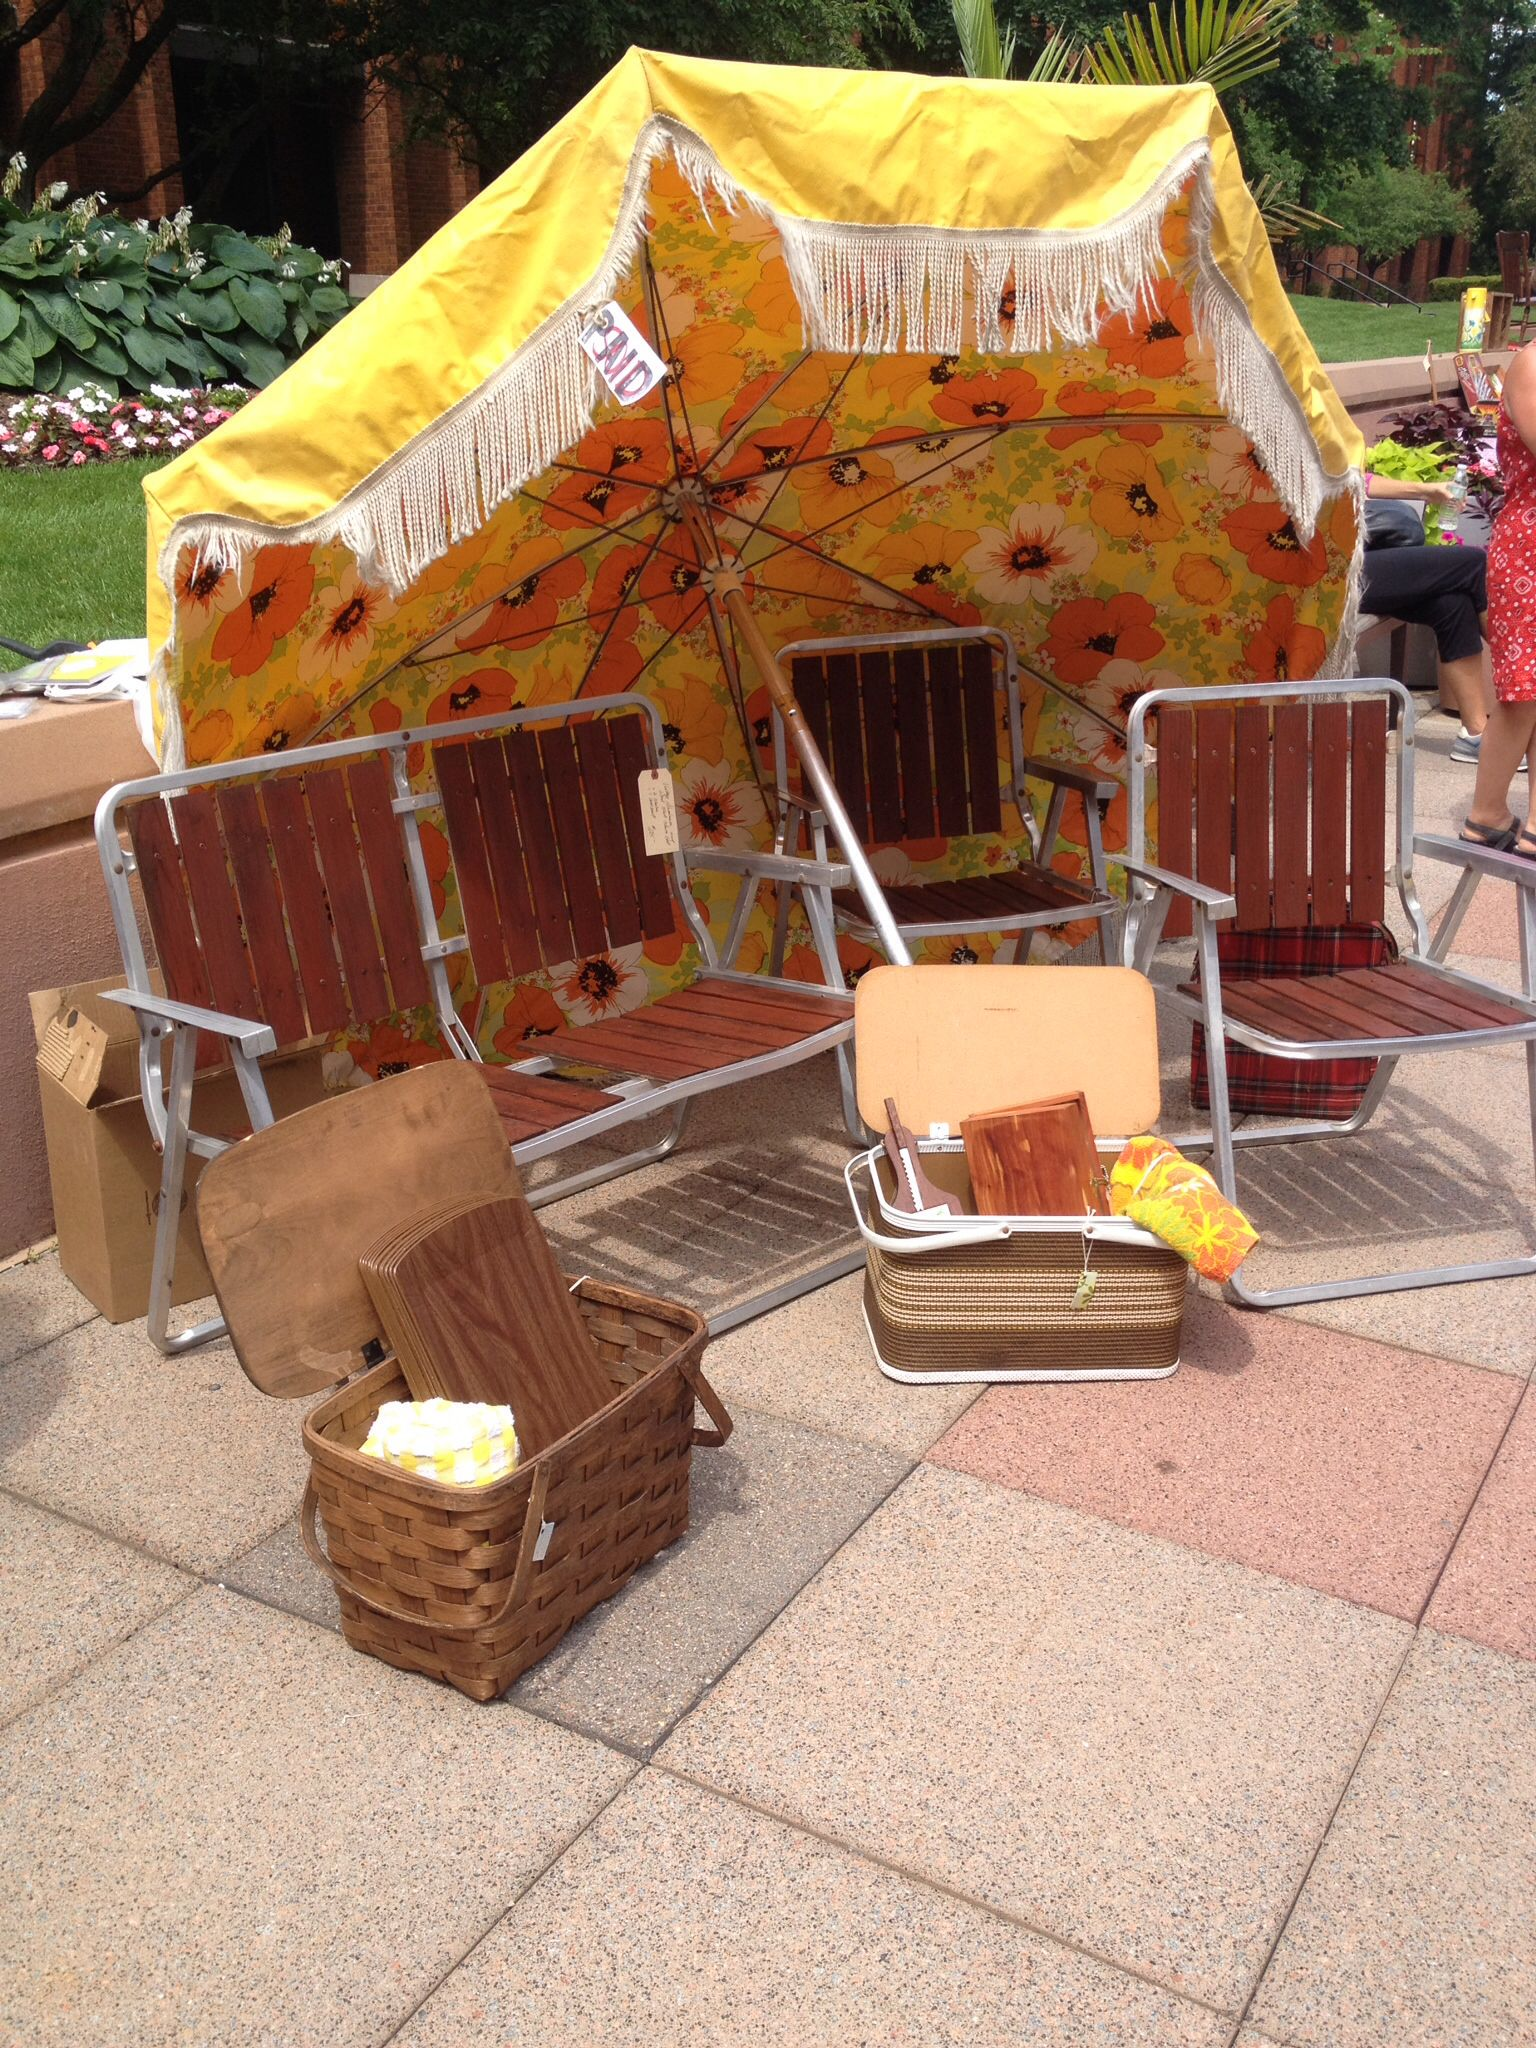 Retro Lawn Chairs U0026 Umbrella With Orange U0026 Yellow Flowers. Vintage Market  Bliss